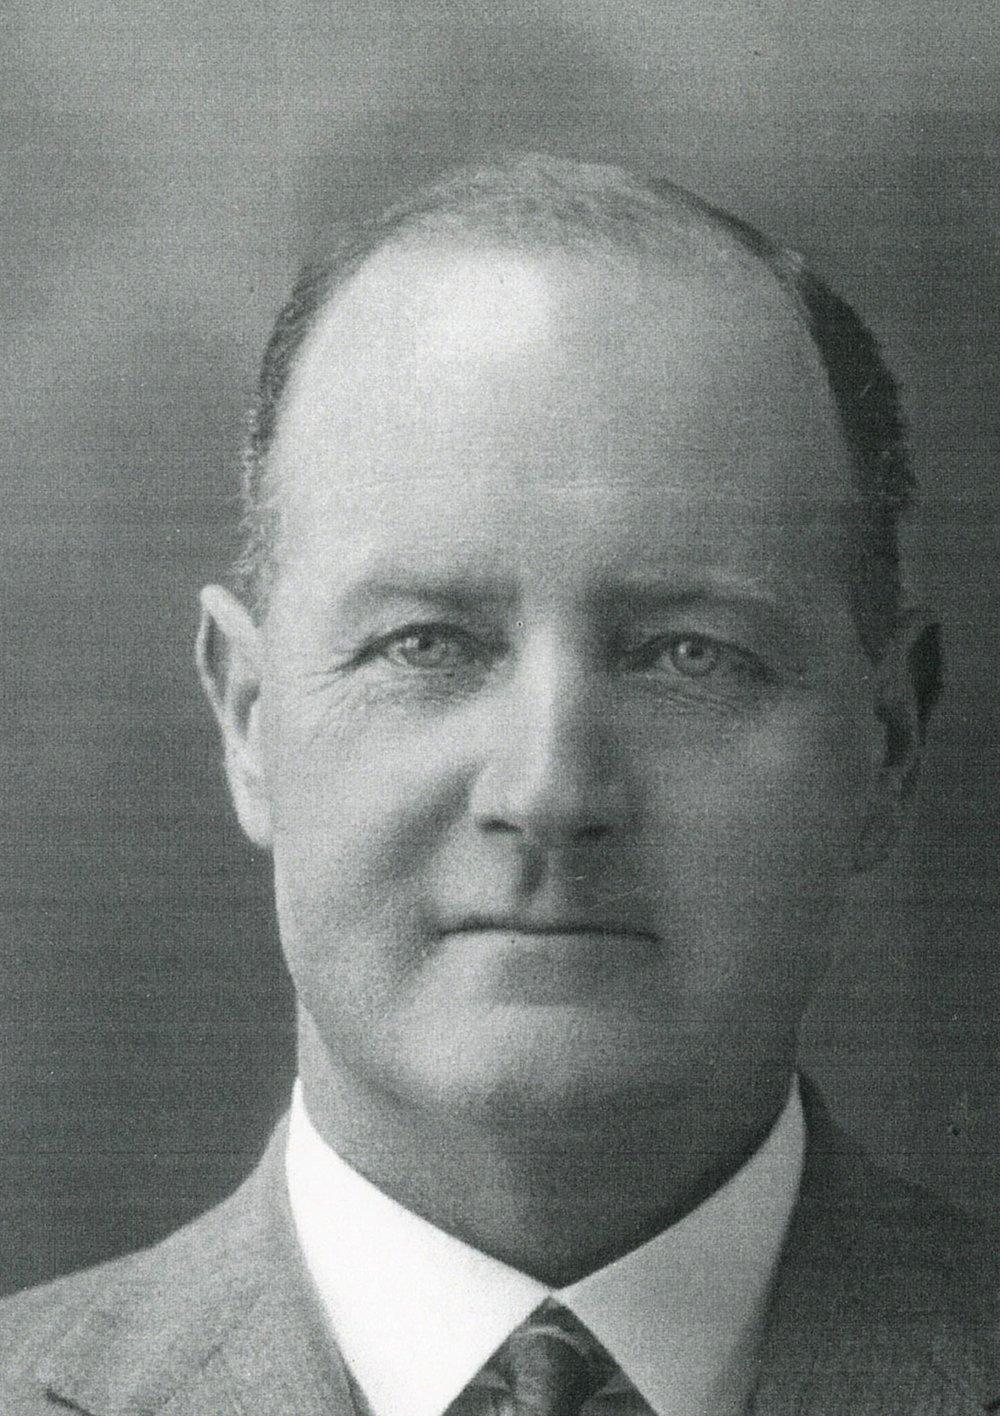 1949 - Colonel David Evans DSO VD*